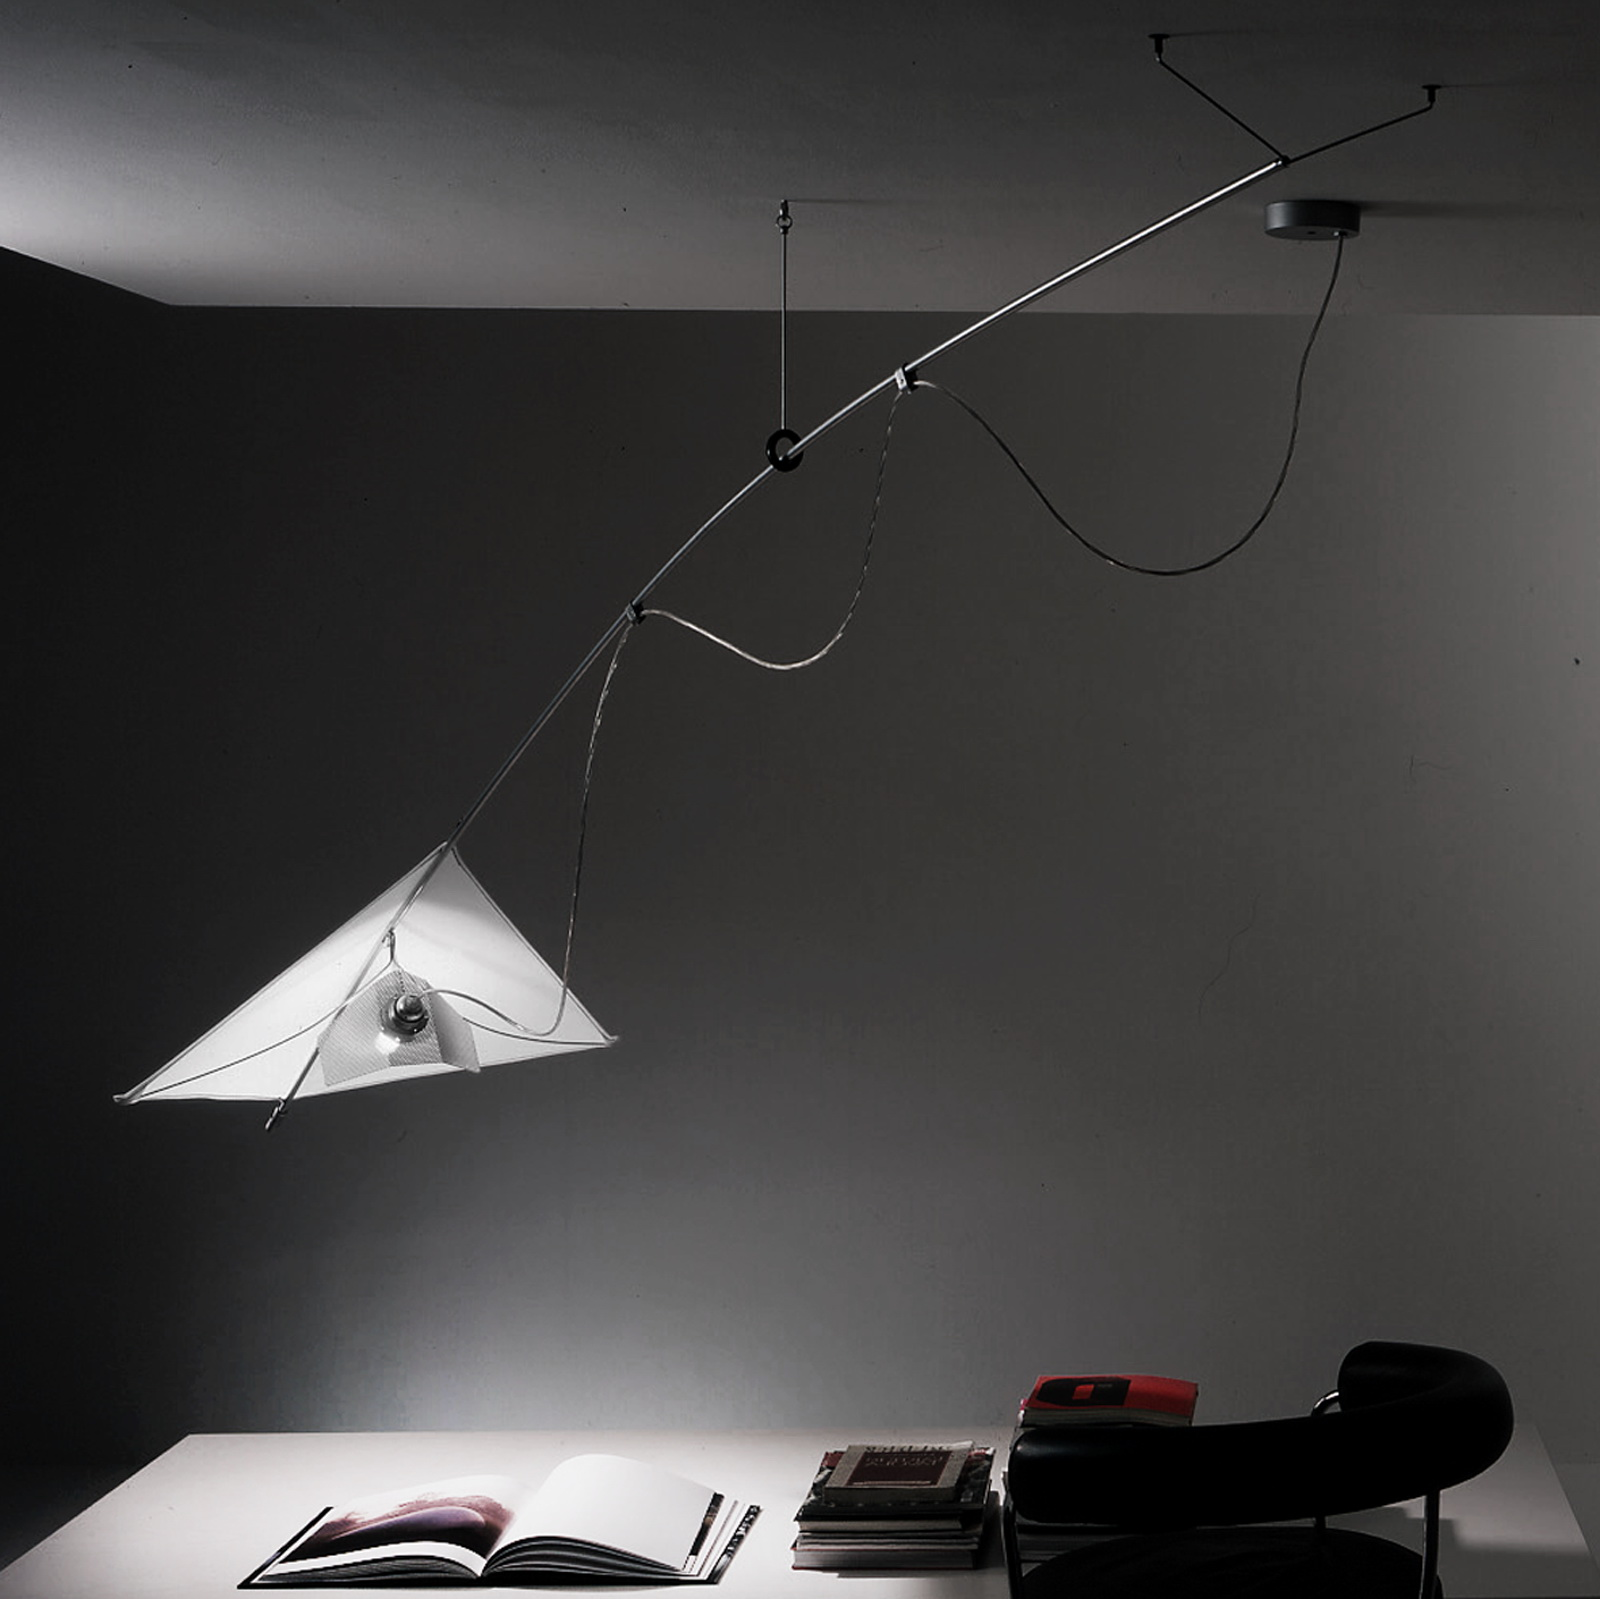 lampadari lucca : Lampada a sospensione orientabile VELA by Martinelli Luce design Paolo ...